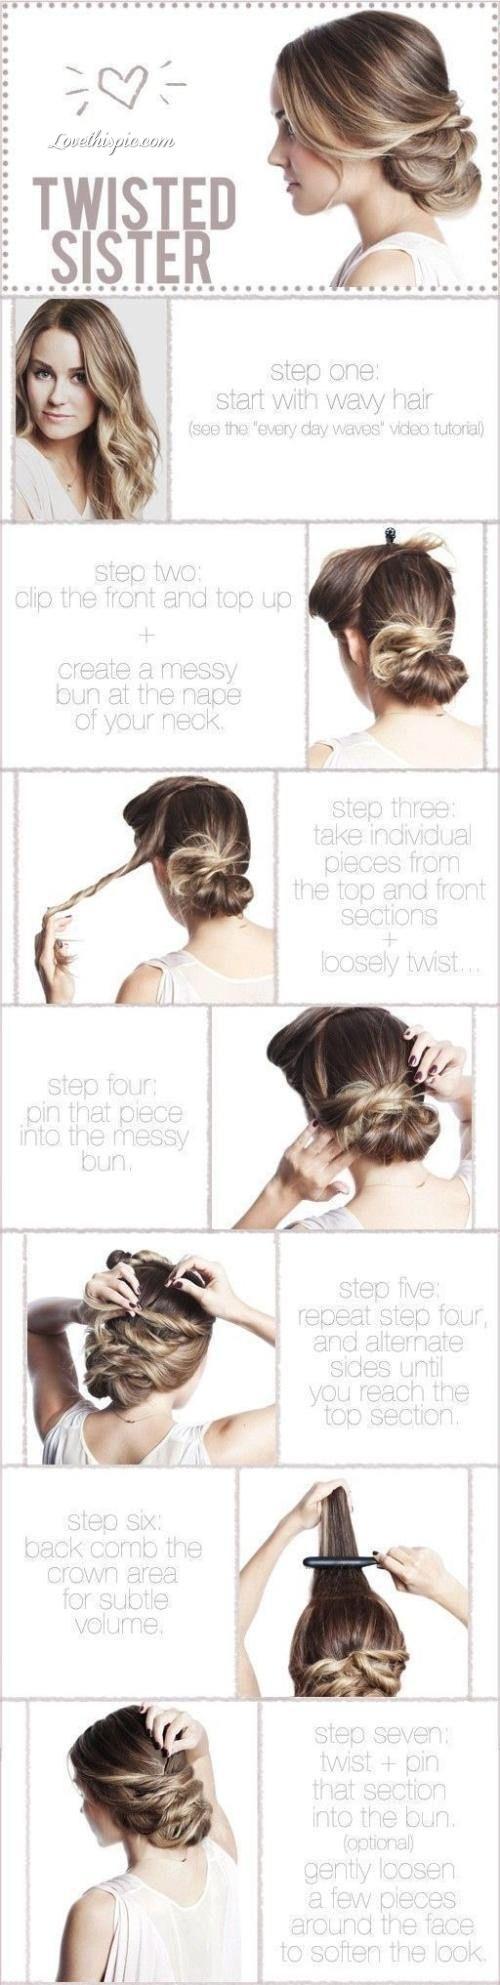 twisted sister hair style girly hair diy hair styles easy diy diy beauty diy hair